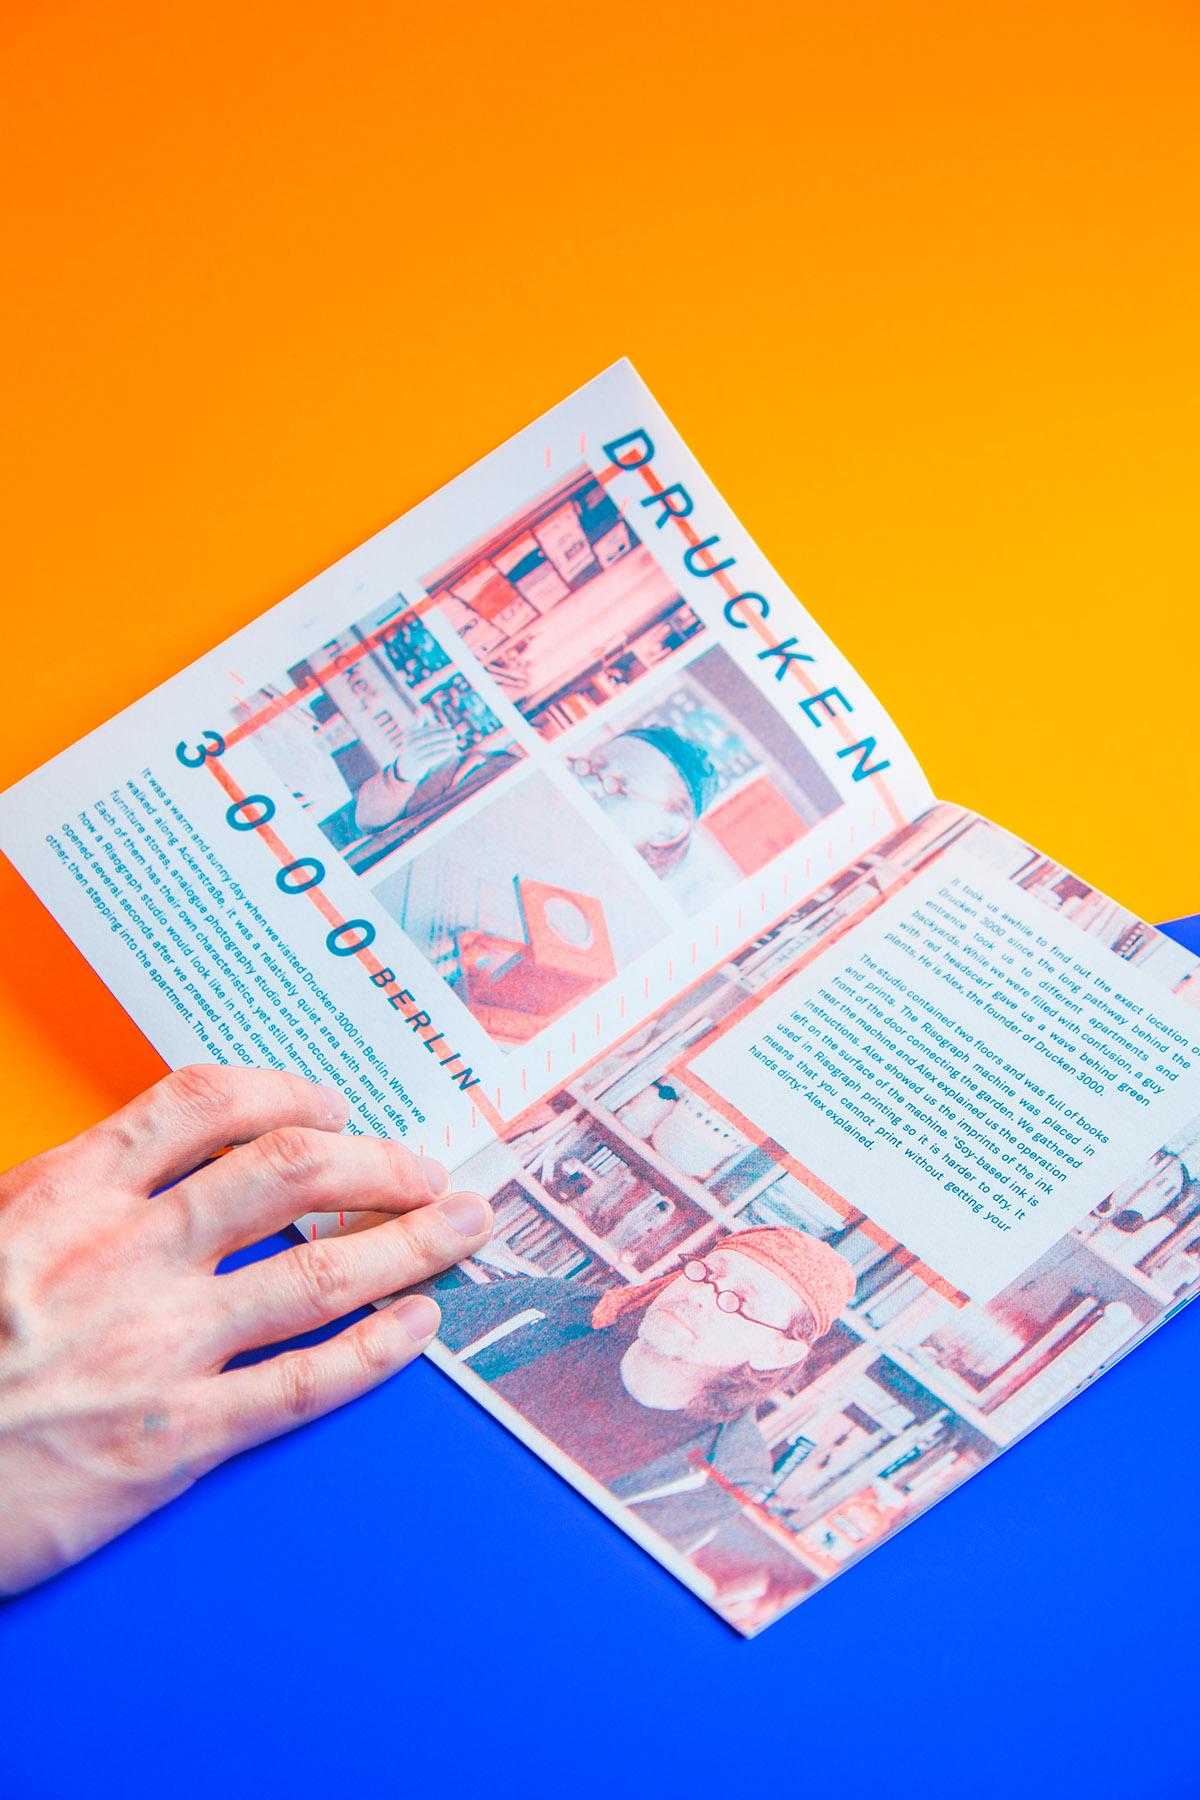 risograph,Printing,Zine ,publishing  ,Layout Design